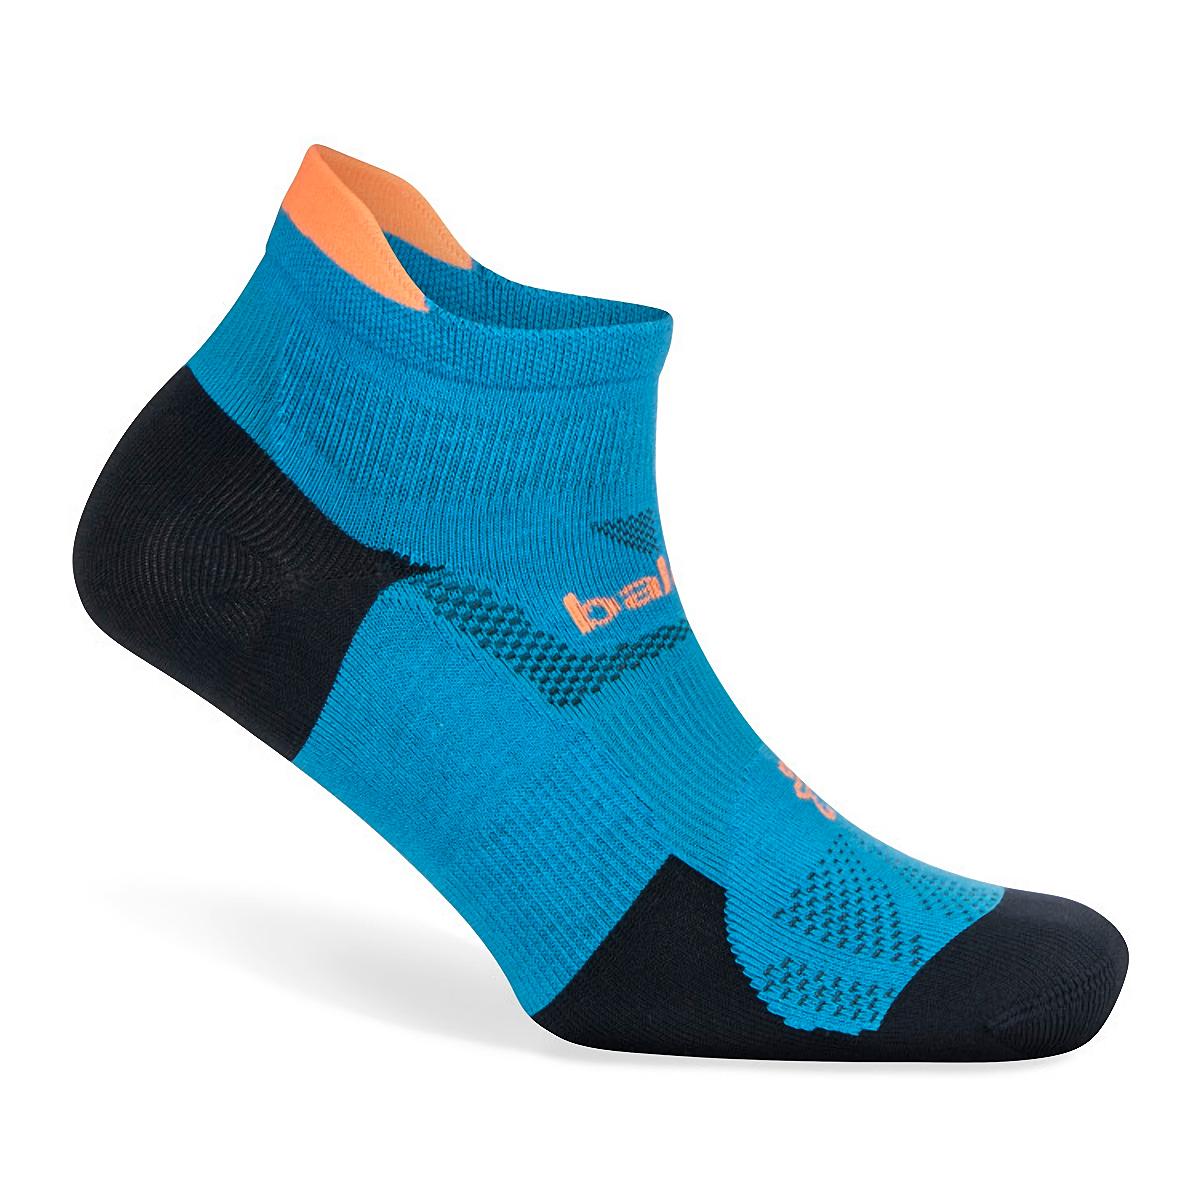 Balega Hidden Dry No Show Socks - Color: Bright Turquoise/Navy - Size: S, Bright Turquoise/Navy, large, image 2